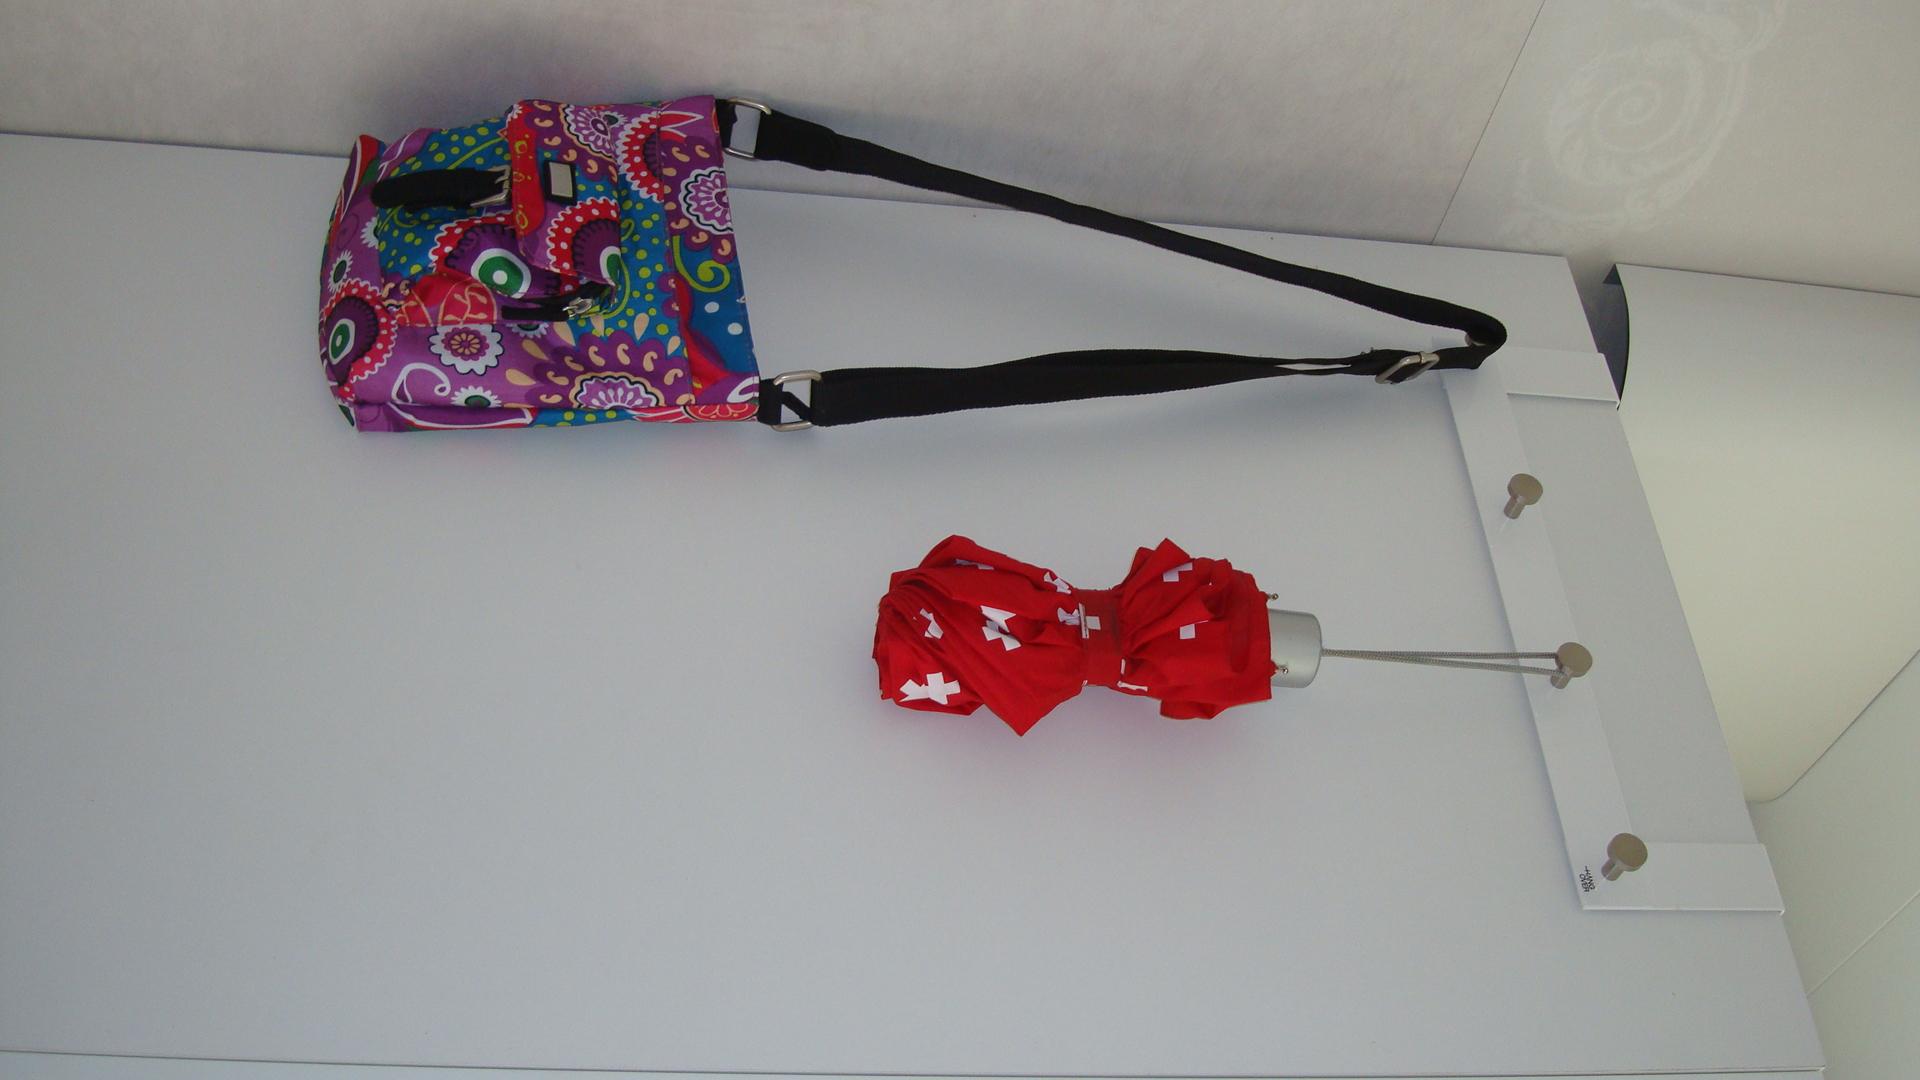 Innovative And Stylish Over Door Hangers Hang Over